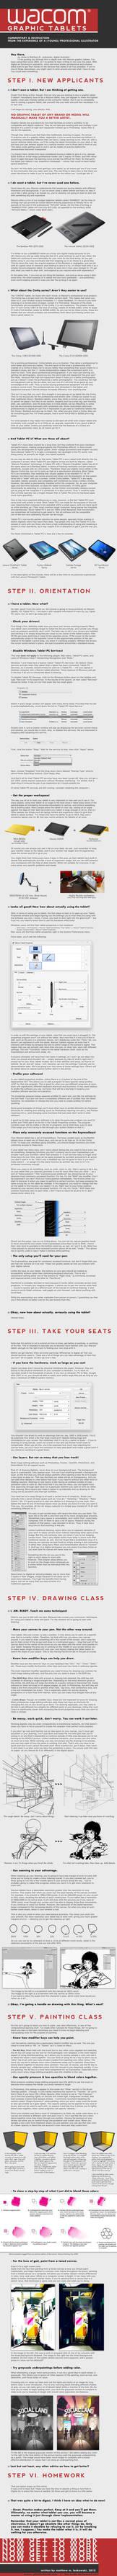 Wacom Starter's Guide 2011 by fox-orian